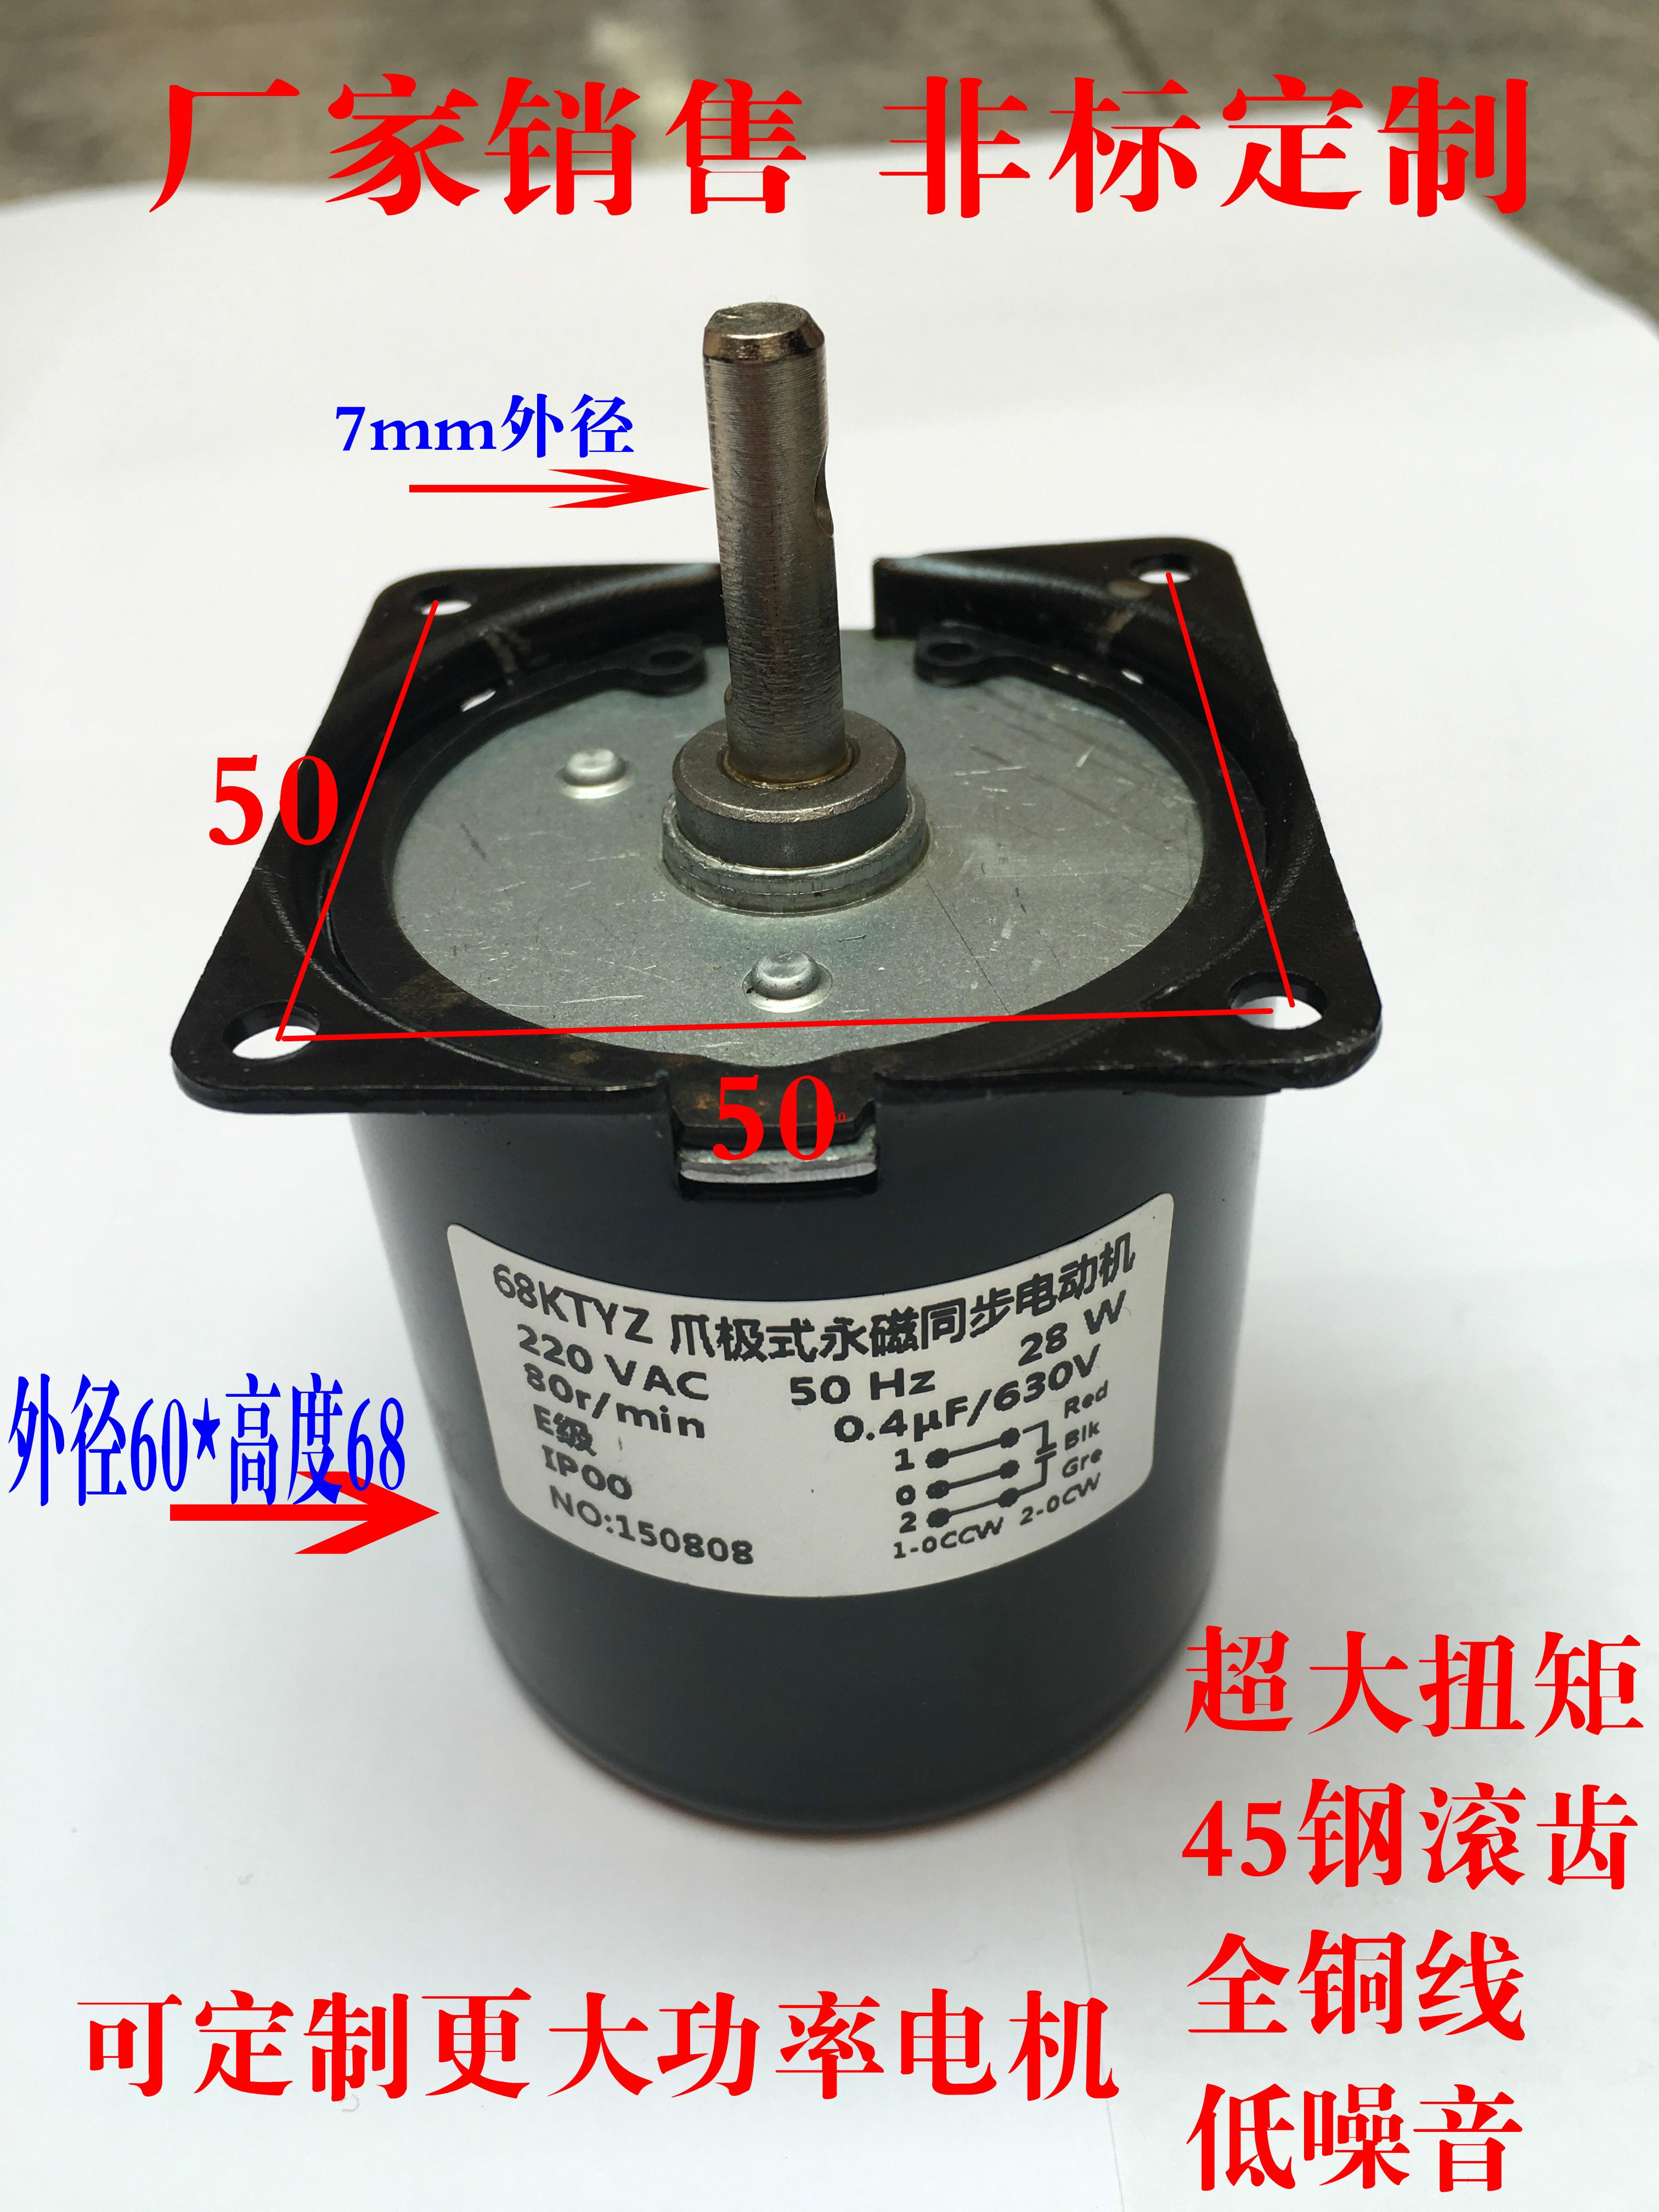 68KTYZ permanent magnet synchronous motor 28W 45#steel hobbing 1 2 2 5 5 10  50 60 80 100 rpm